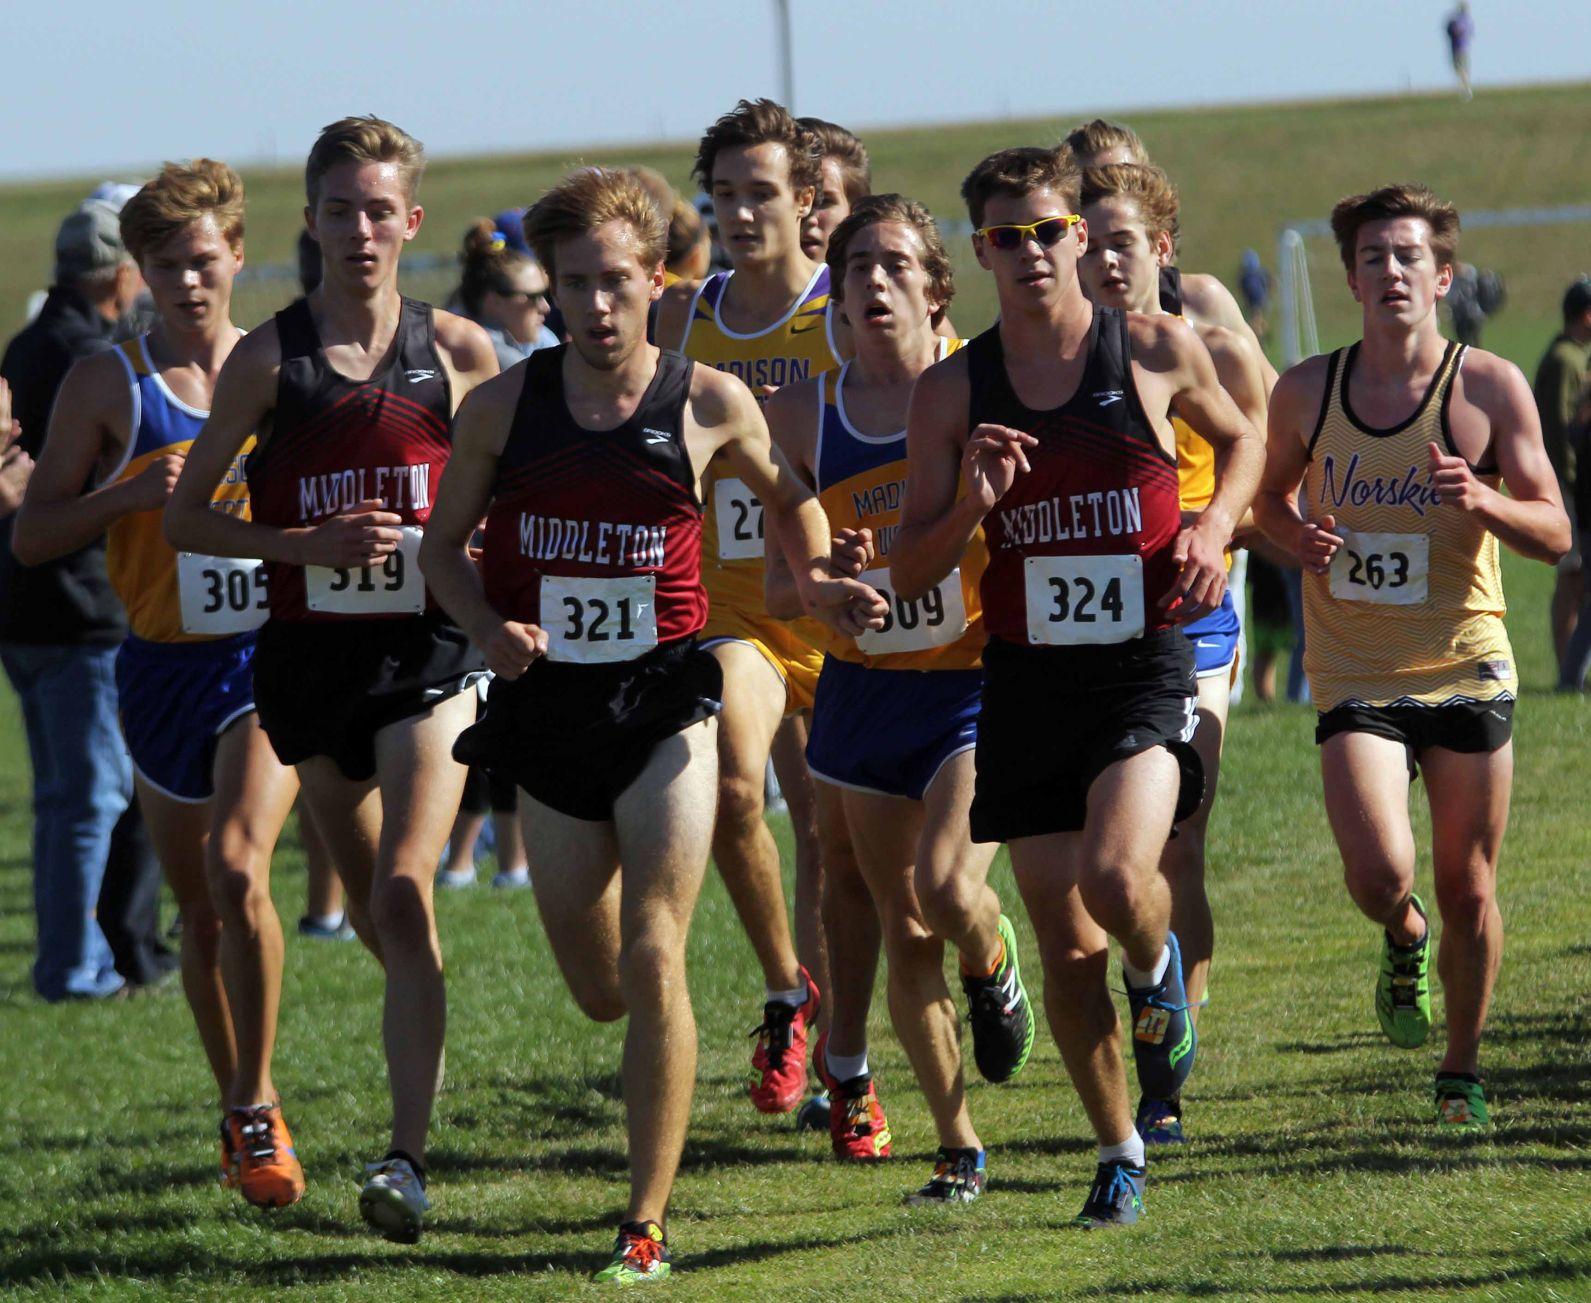 prep cross country preview middleton boys sun prairie girls enter rh madison com